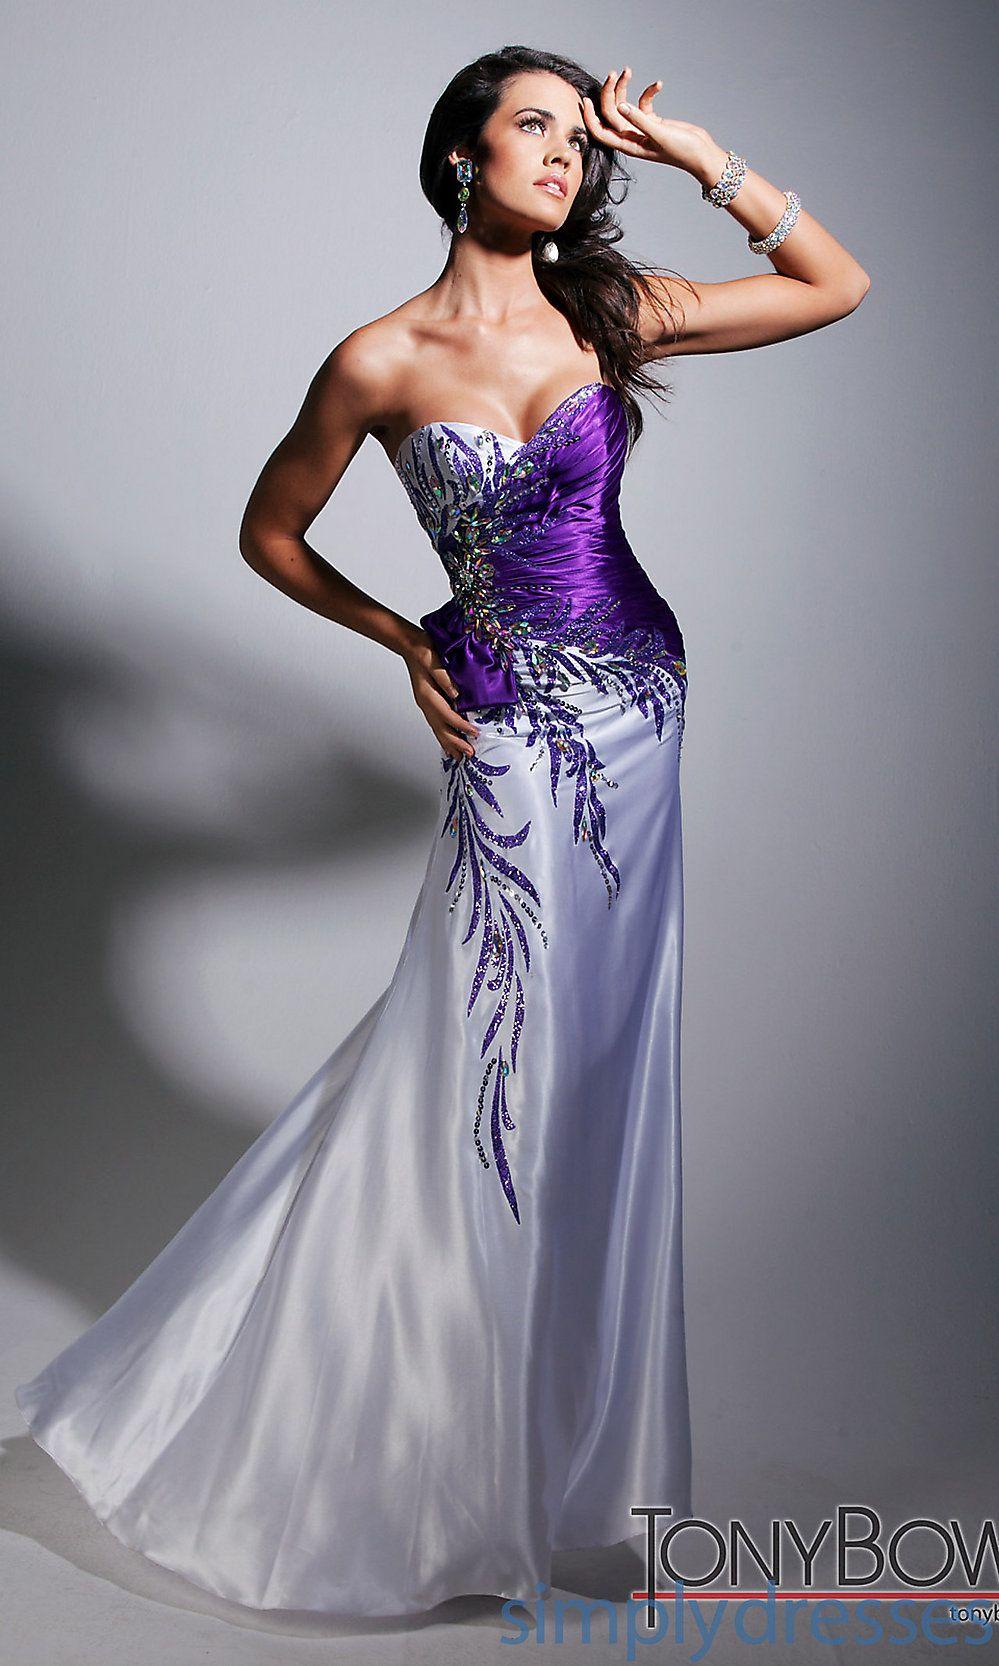 Mardi Gras Ball Dress | CAJUN GIRL \